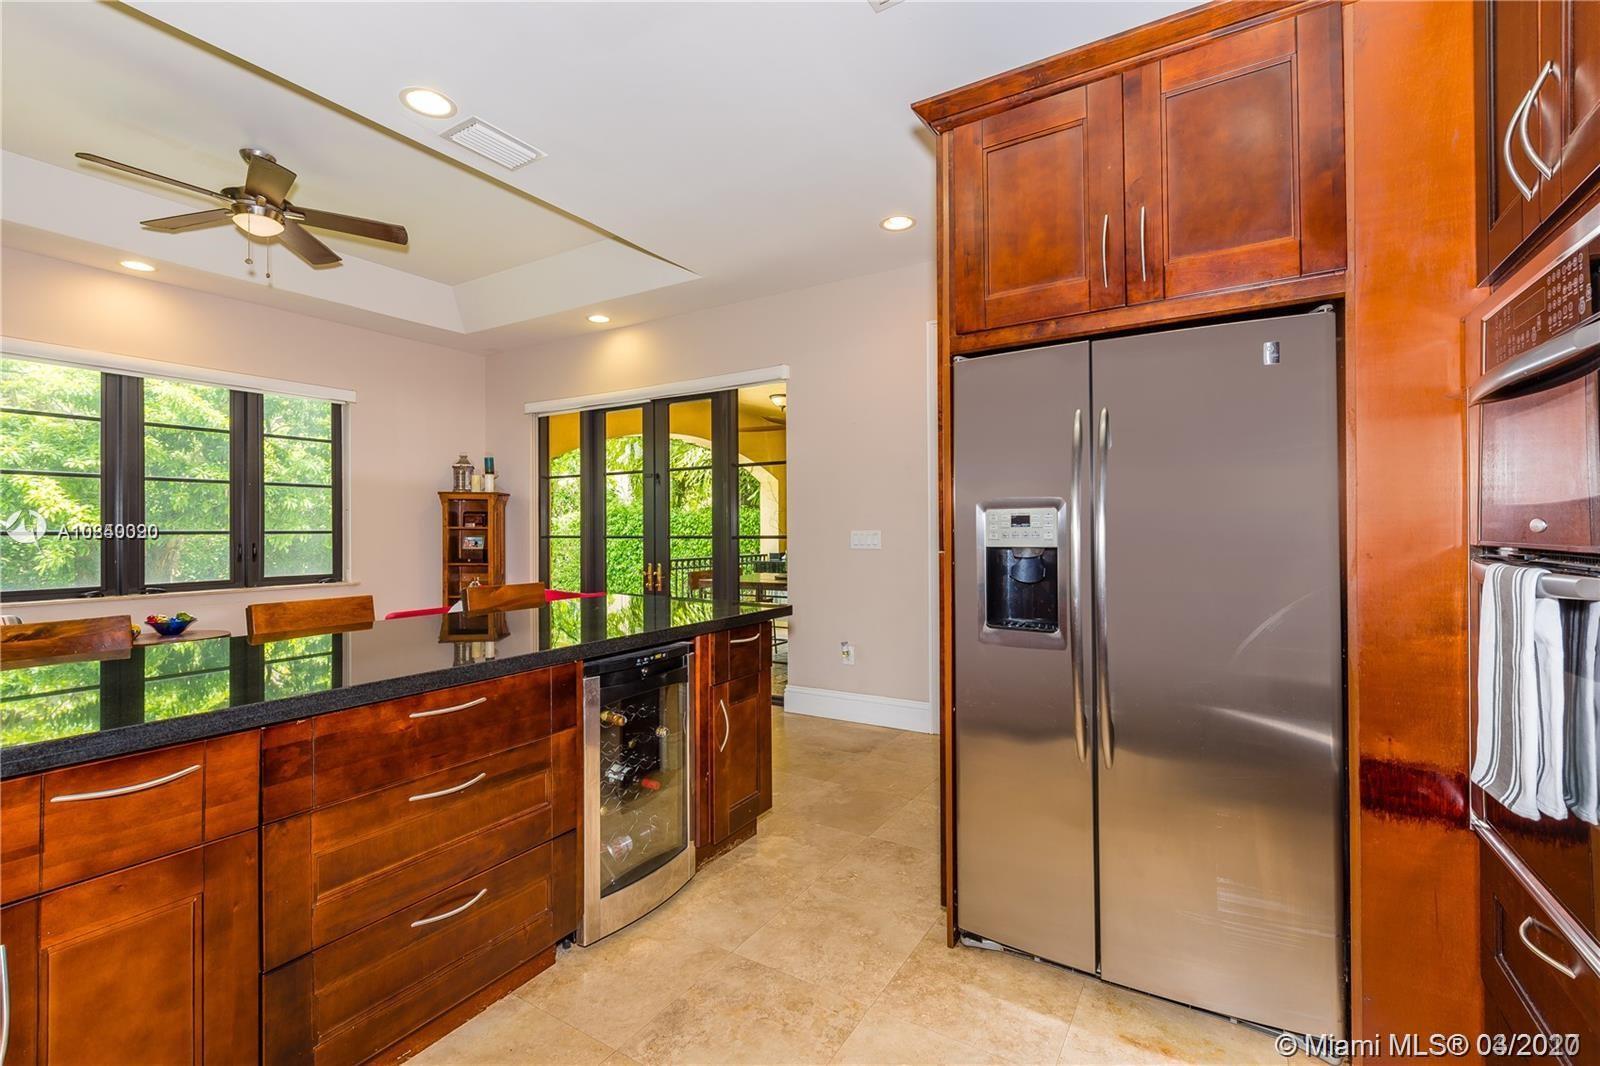 611 Bird Rd, Coral Gables, Florida 33146, 4 Bedrooms Bedrooms, ,3 BathroomsBathrooms,Residential,For Sale,611 Bird Rd,A10840090